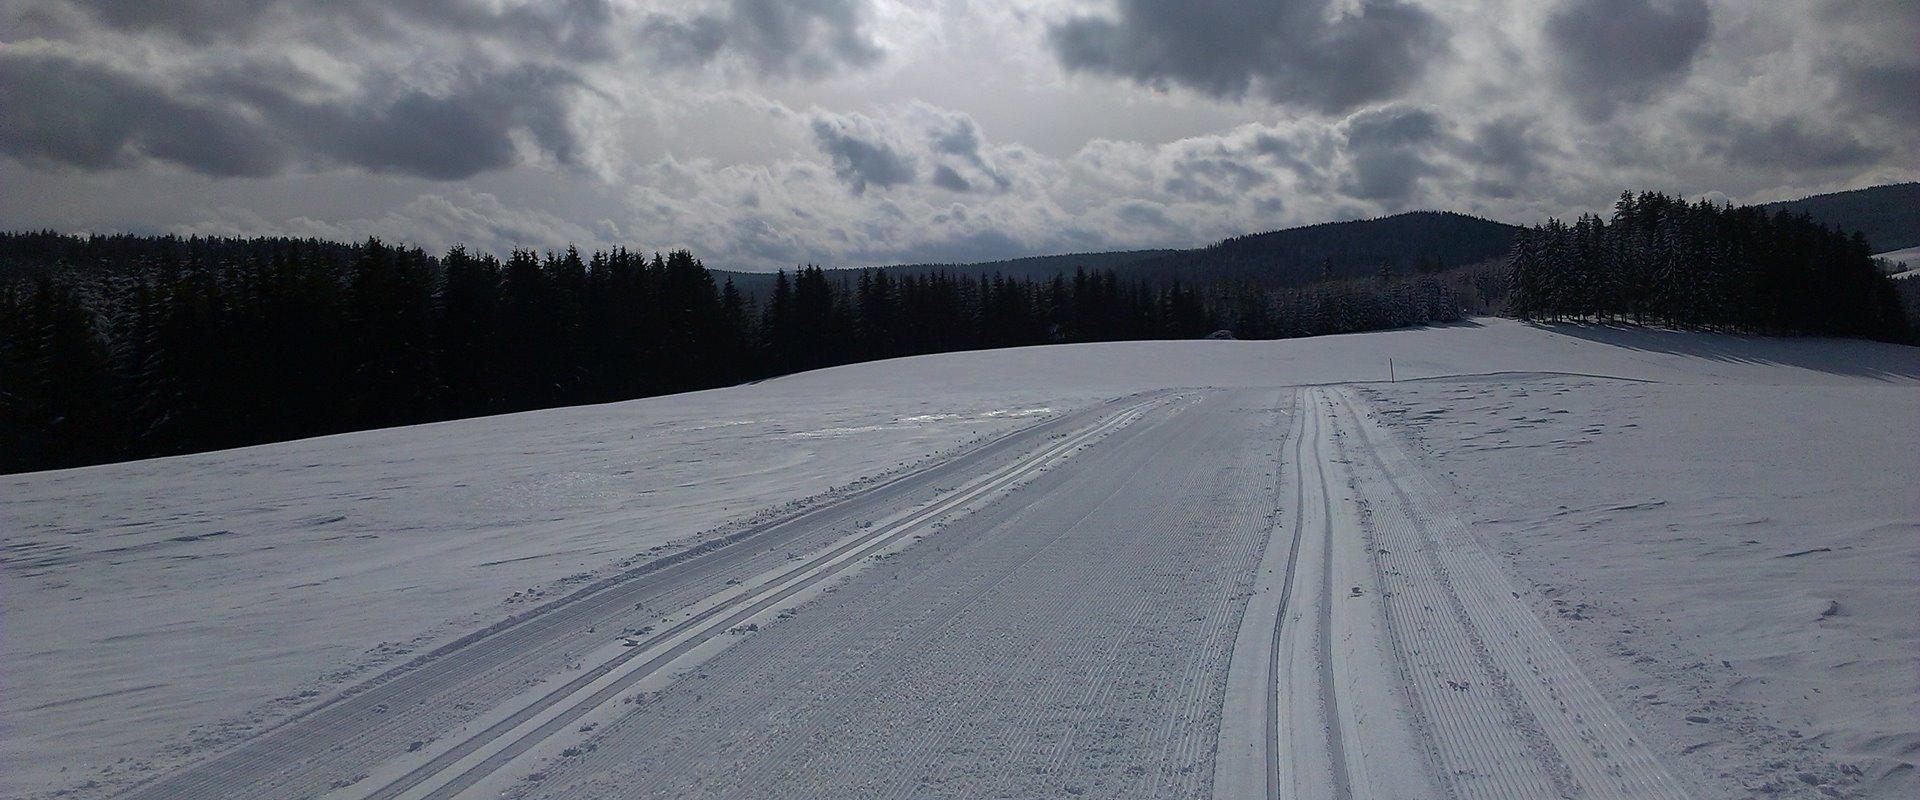 Loipe im oberen Jostal / Griesbachhof-Schwarzwald